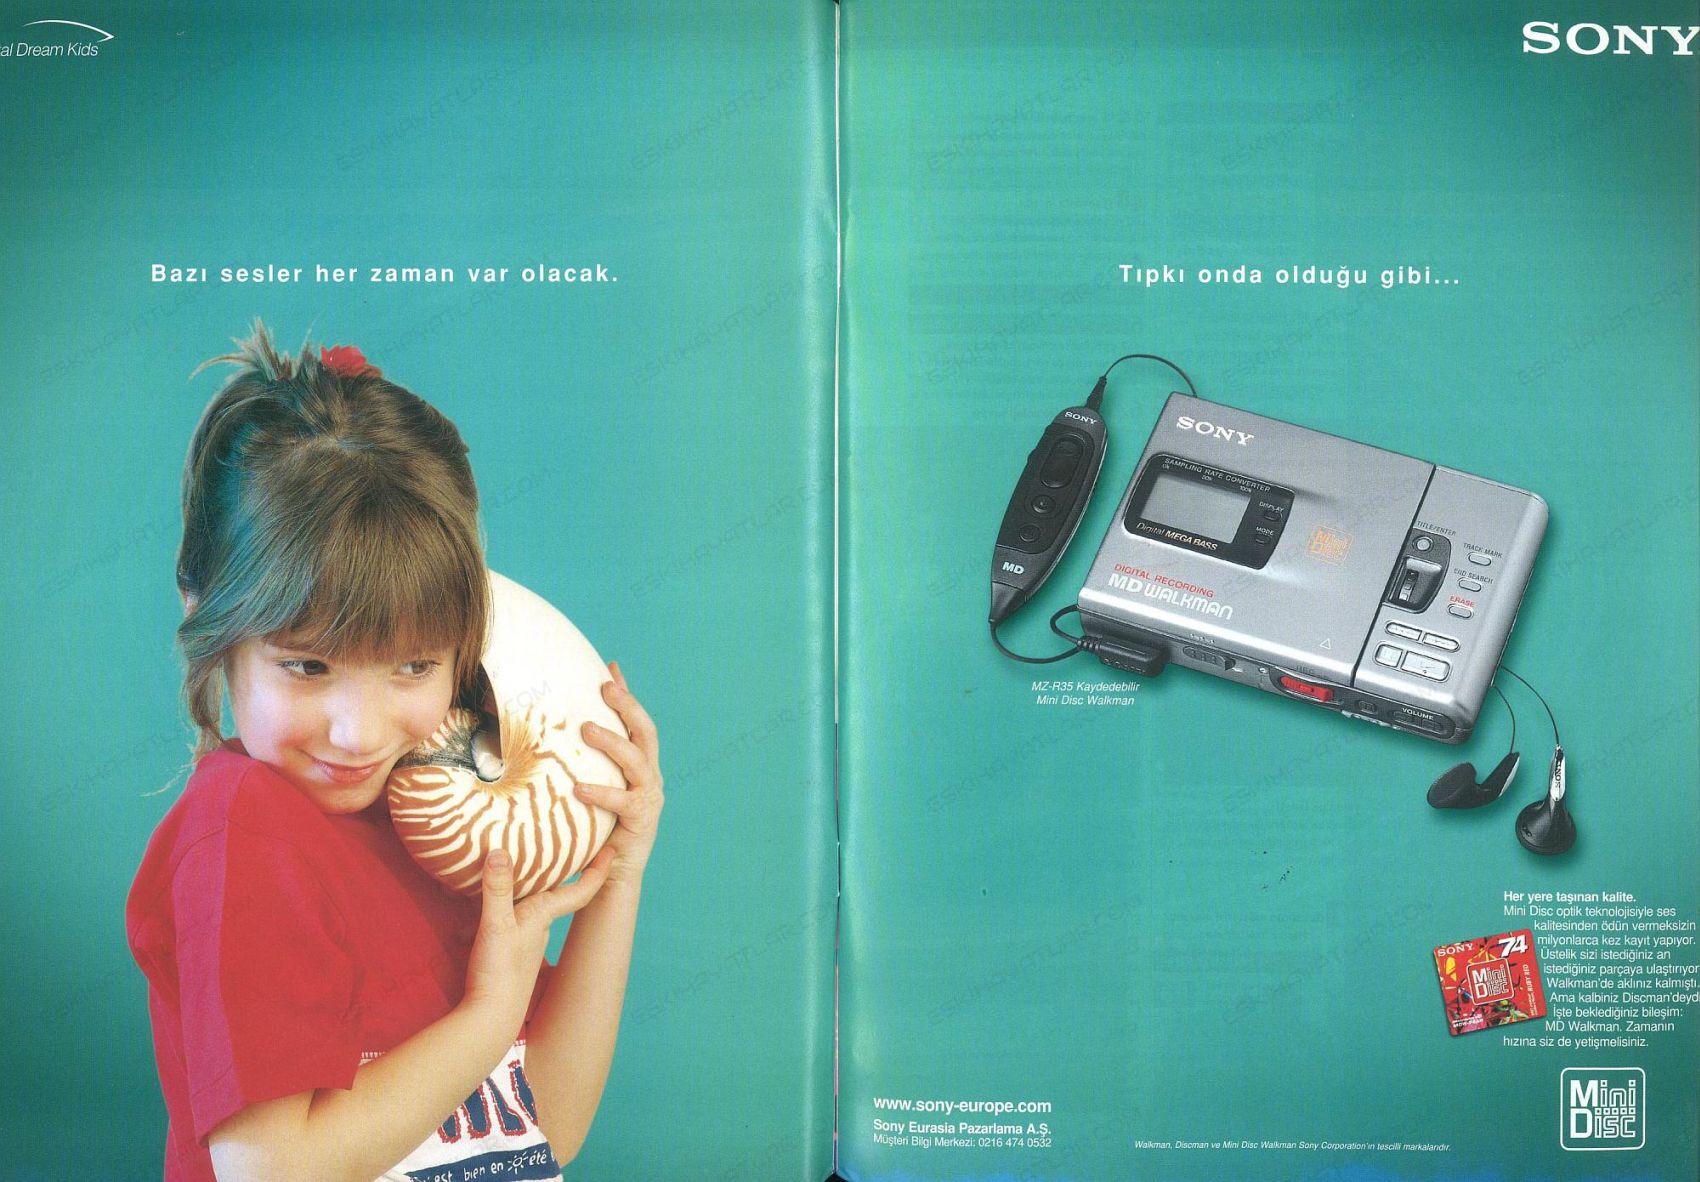 0416-sony-minidisc-reklami